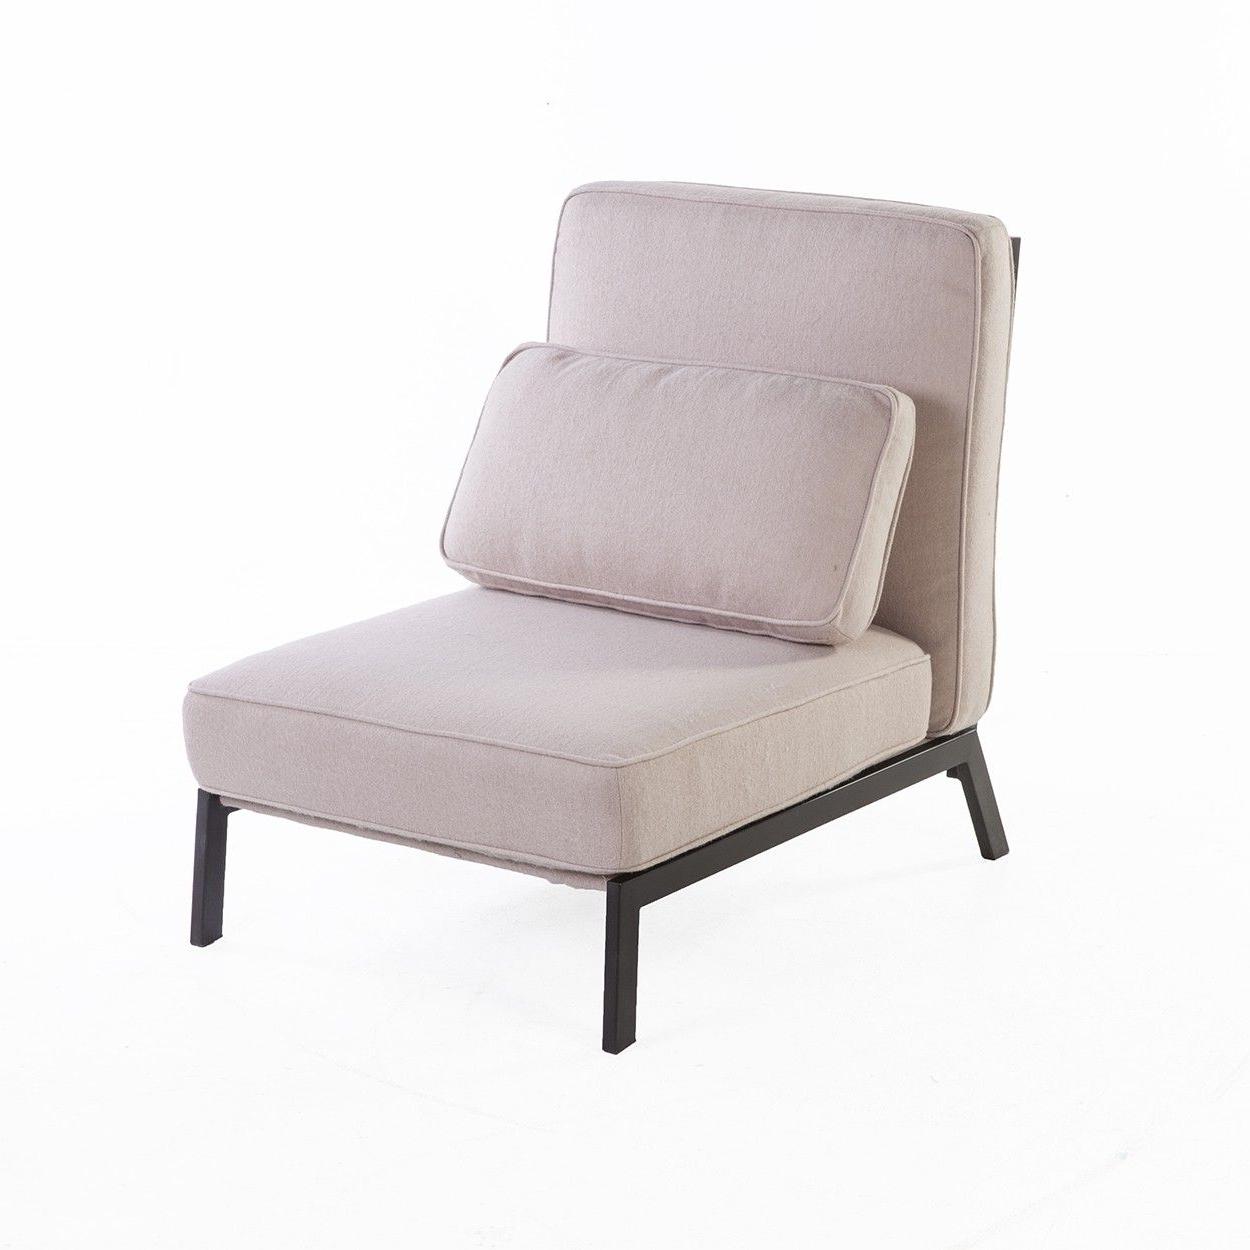 Giguere Barrel Chairs Inside Current Einhorn Lounge Chair – Beige (View 17 of 20)